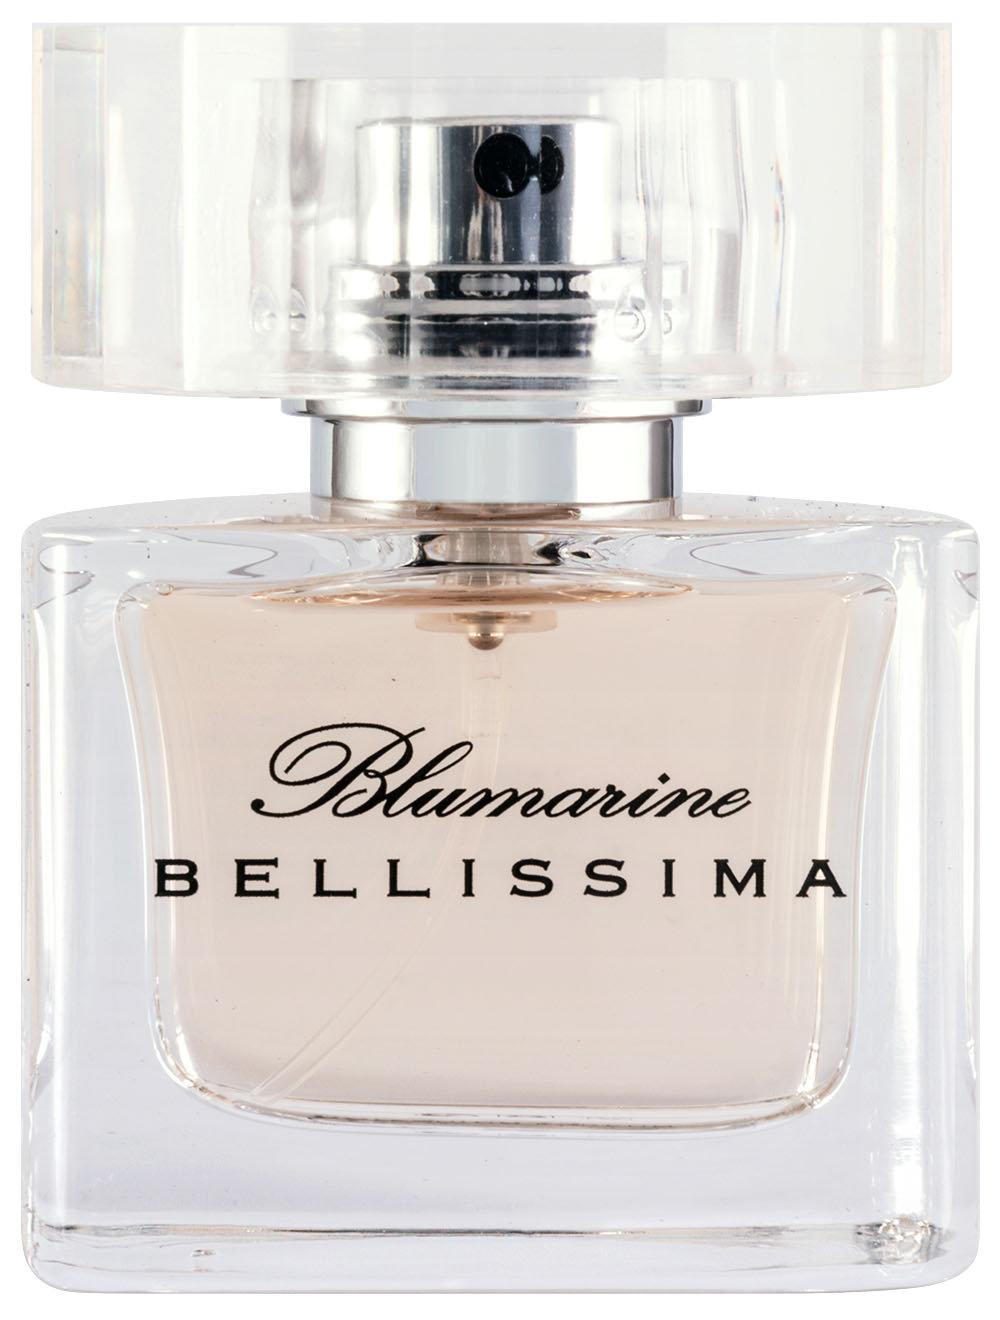 Blumarine Bellissima Eau de Parfum